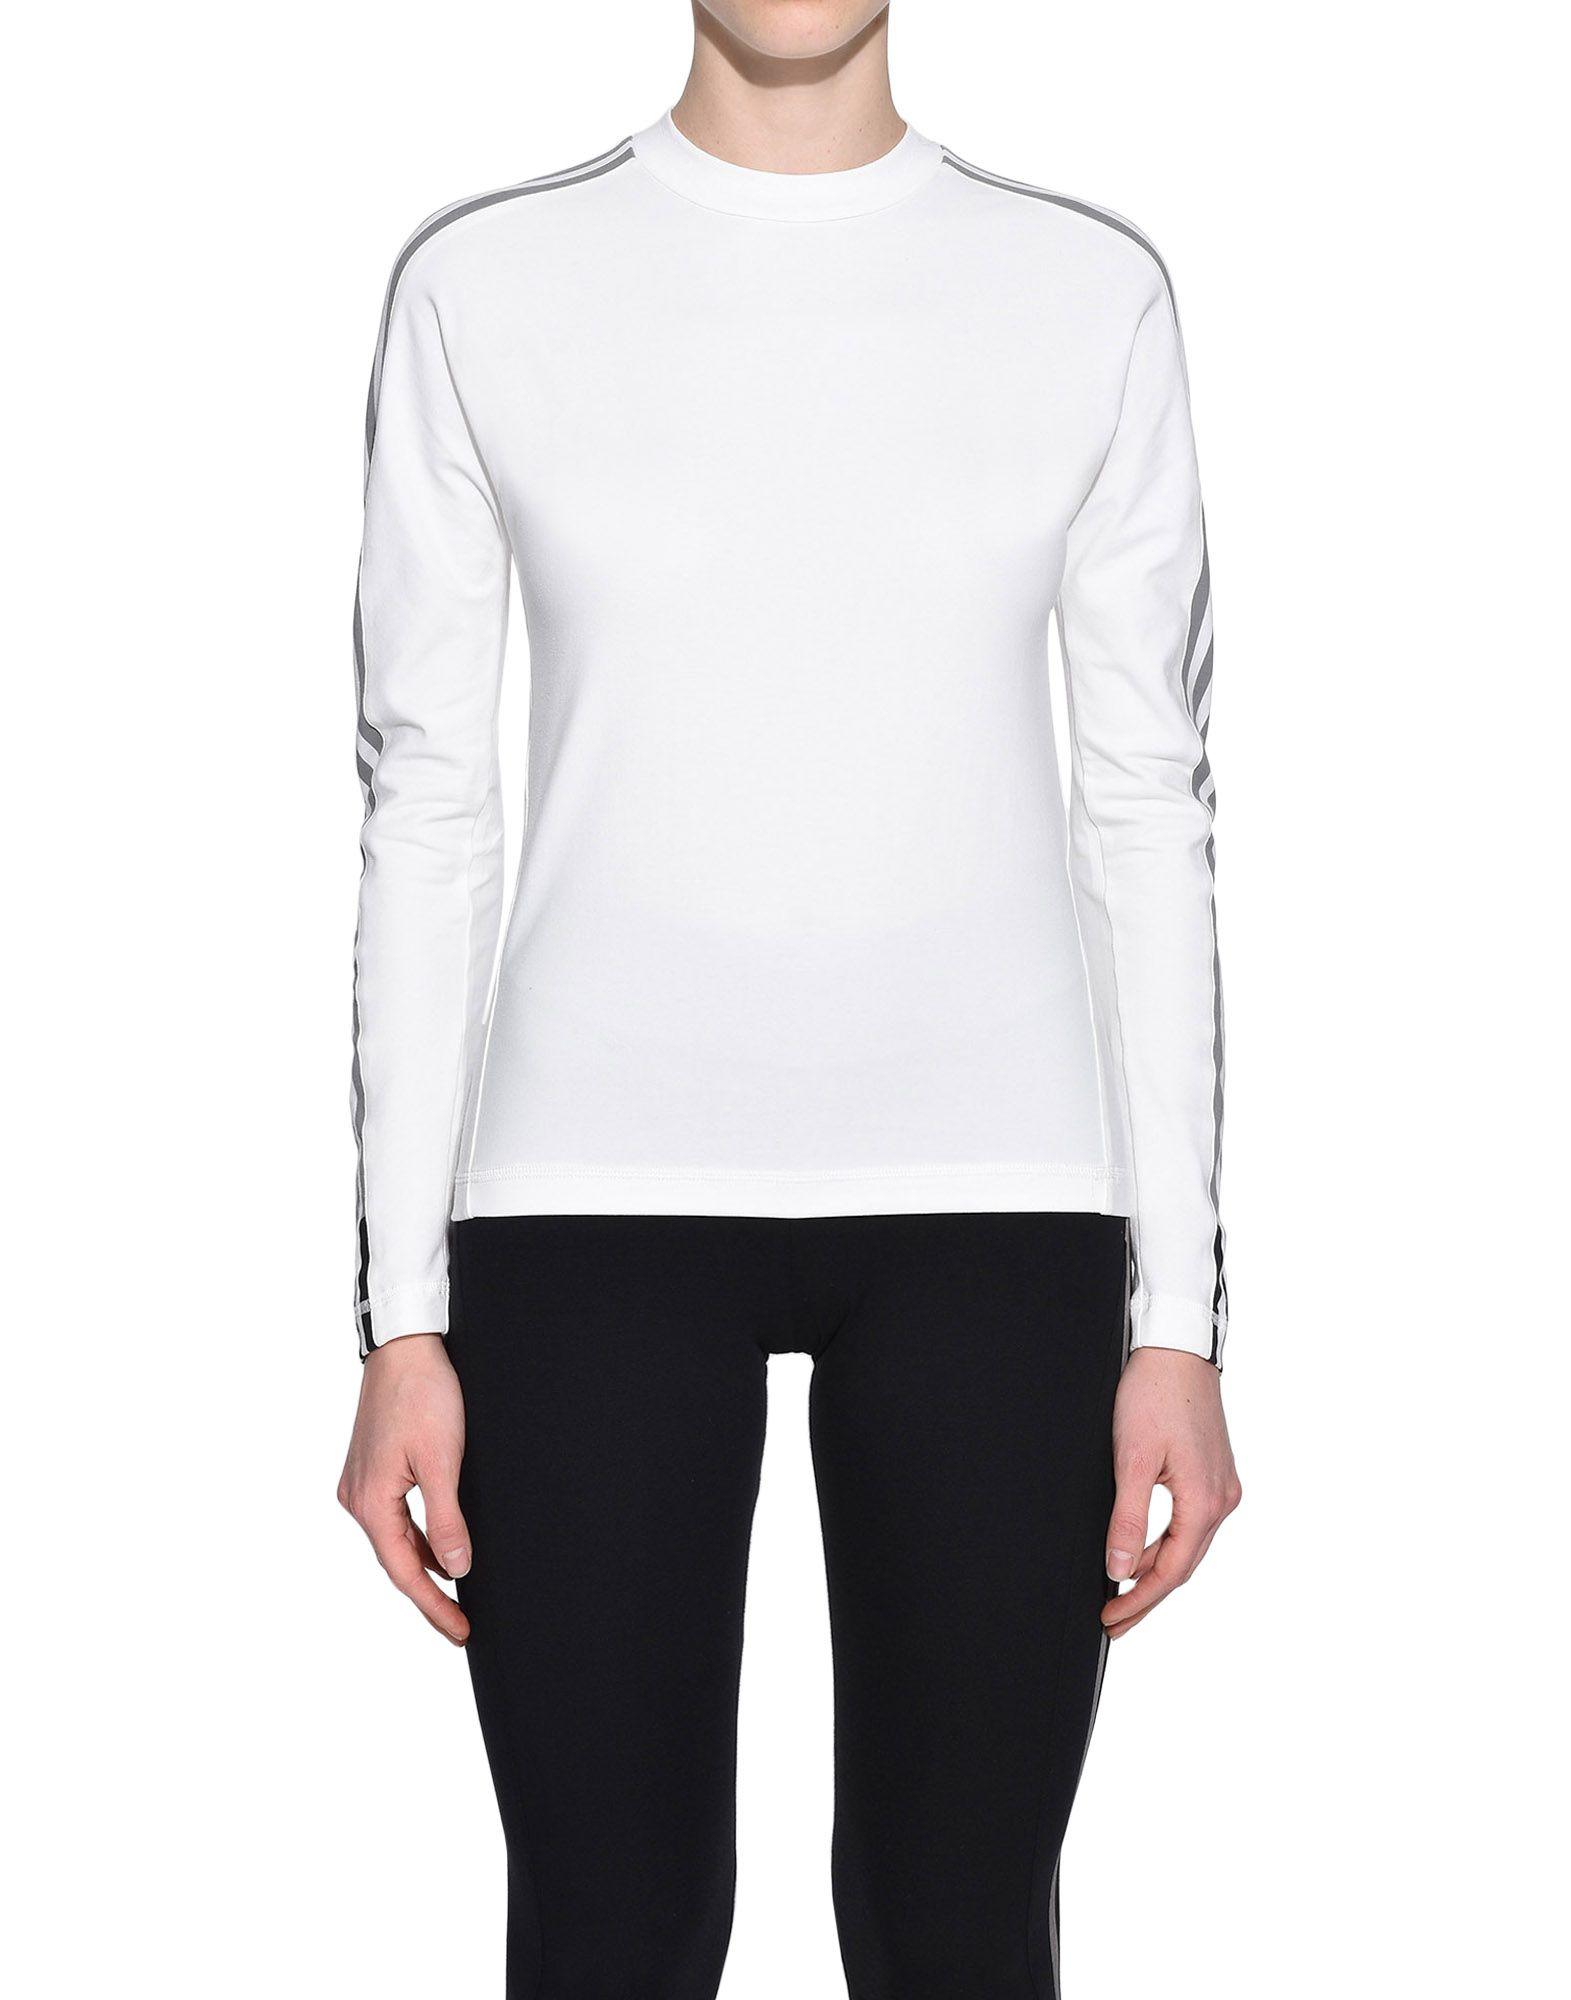 Y-3 Y-3 3-Stripes Tee Long sleeve t-shirt Woman r